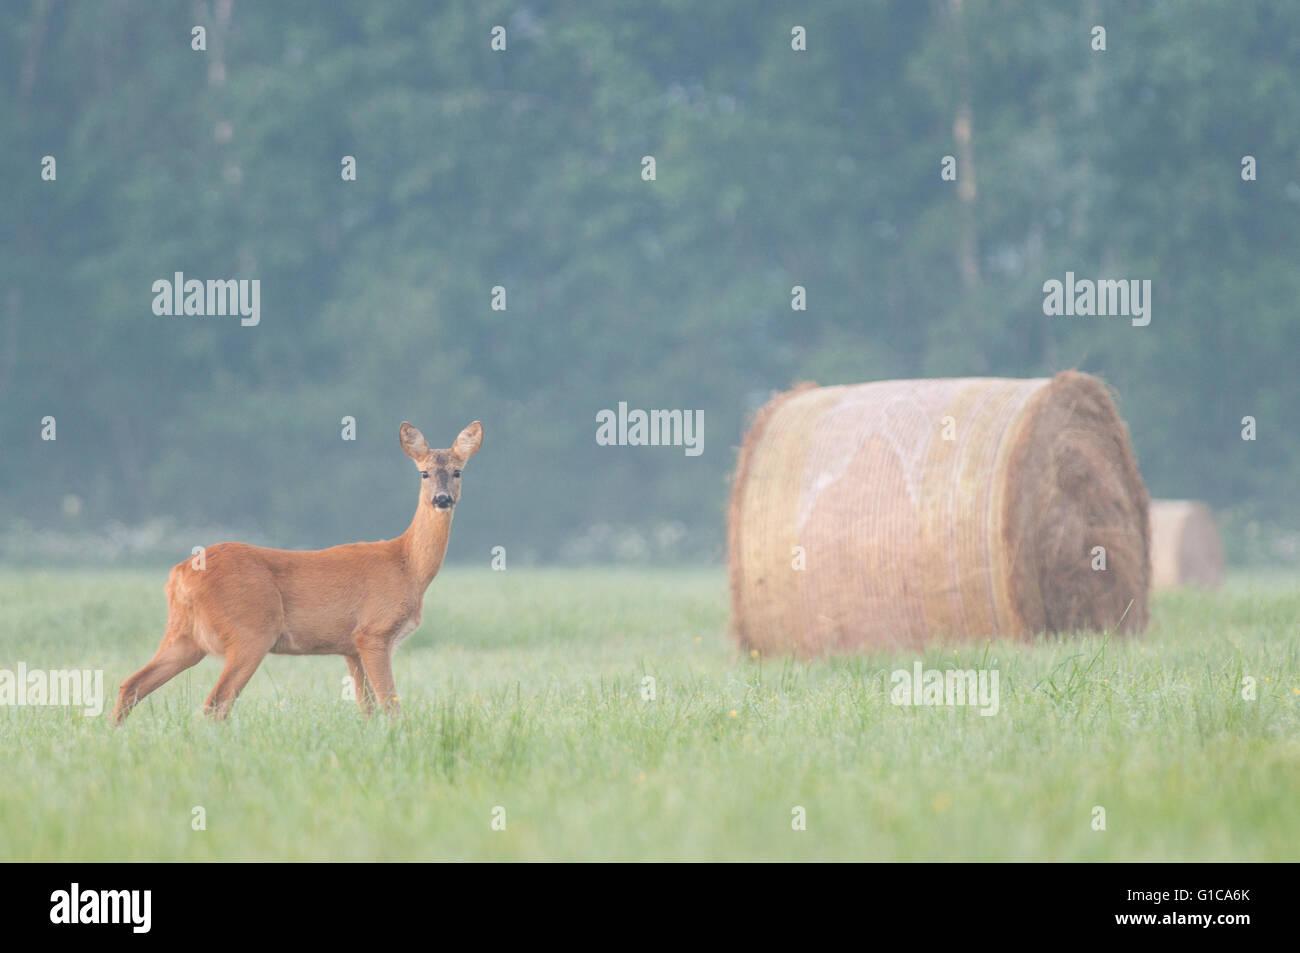 Roe deer on the meadow - Stock Image